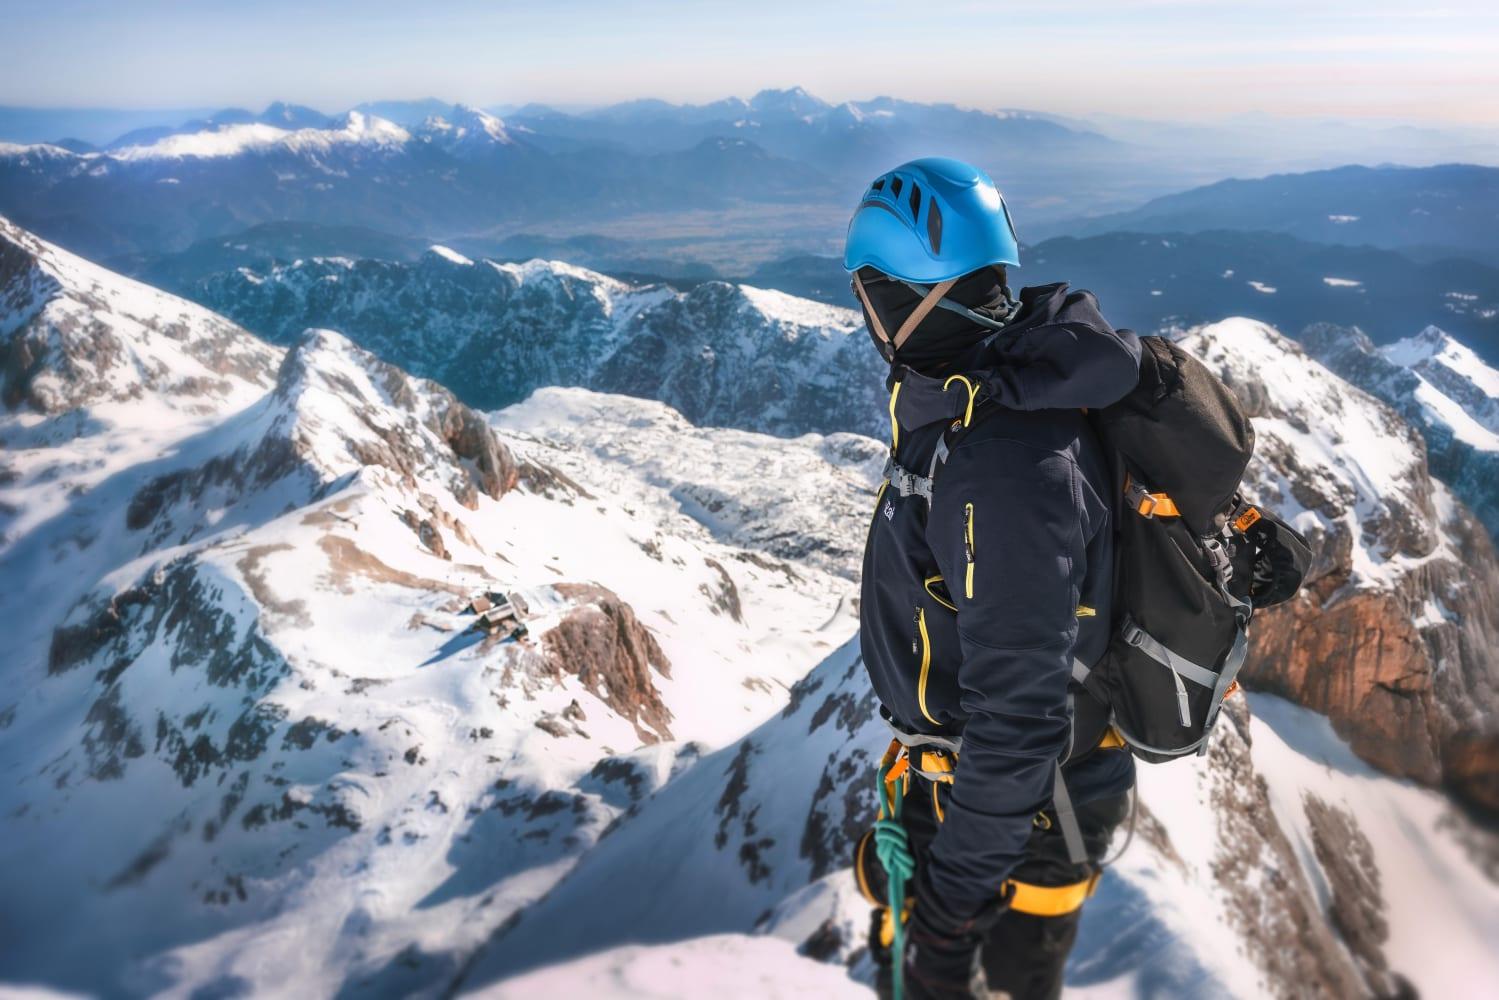 Mountaineering: 11 amazing peaks beginners can summit